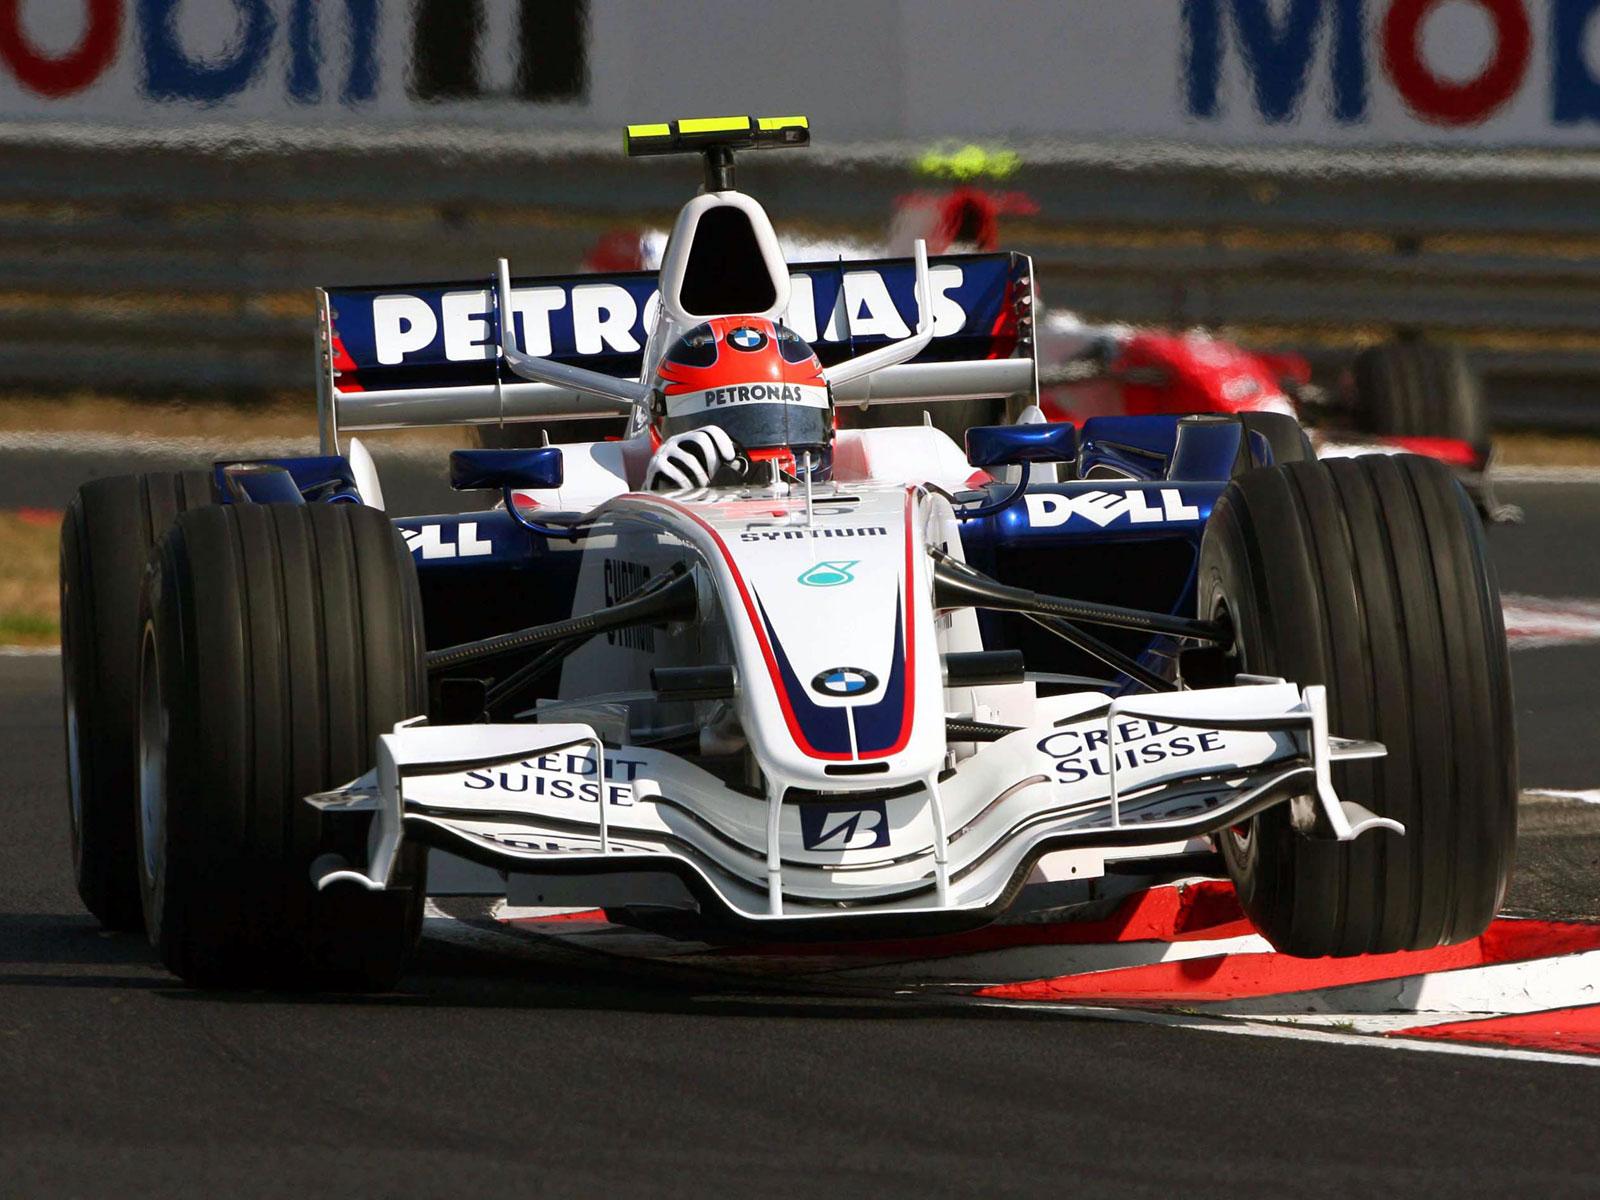 HD Wallpapers 2007 Formula 1 Grand Prix of Hungary | F1 ...